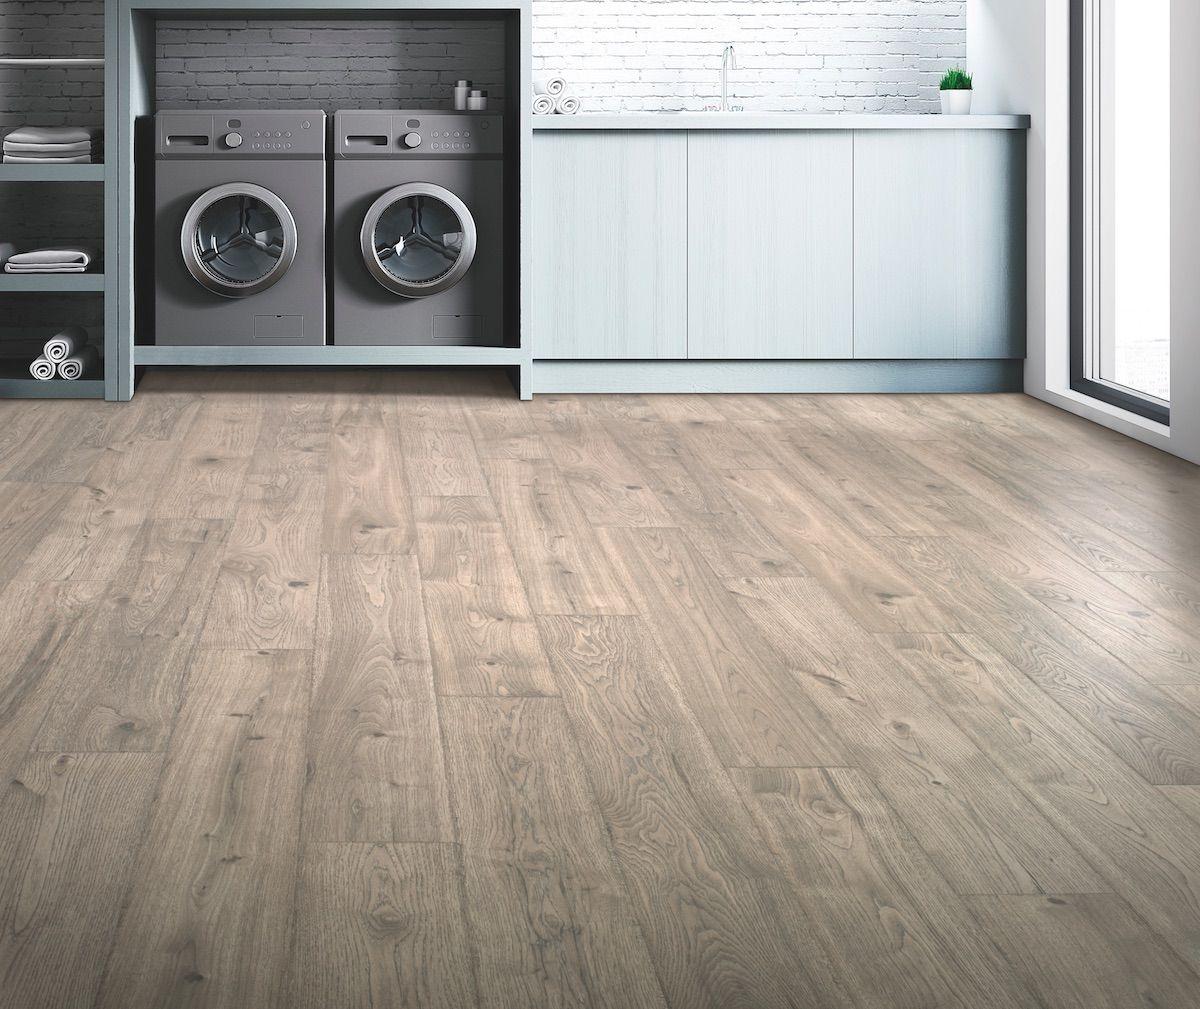 Pin on Warm Wood Floors